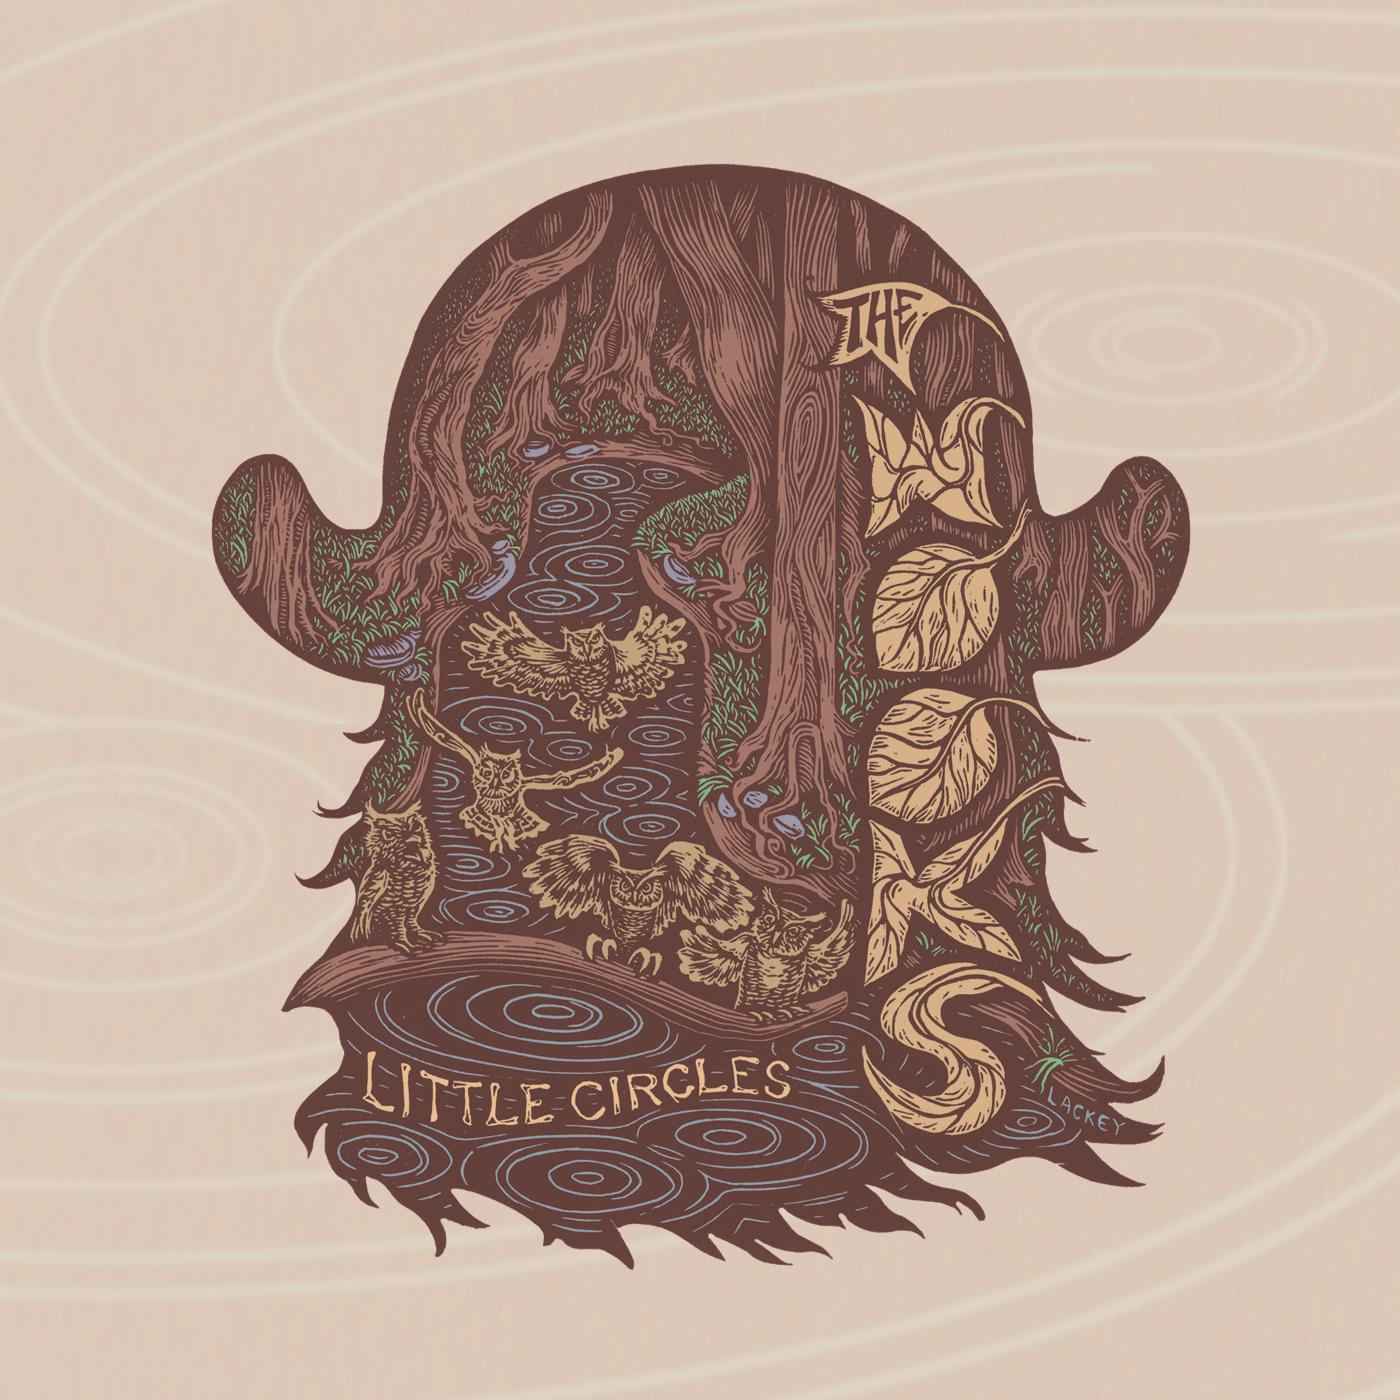 STREAM: The Wooks, 'Little Circles'